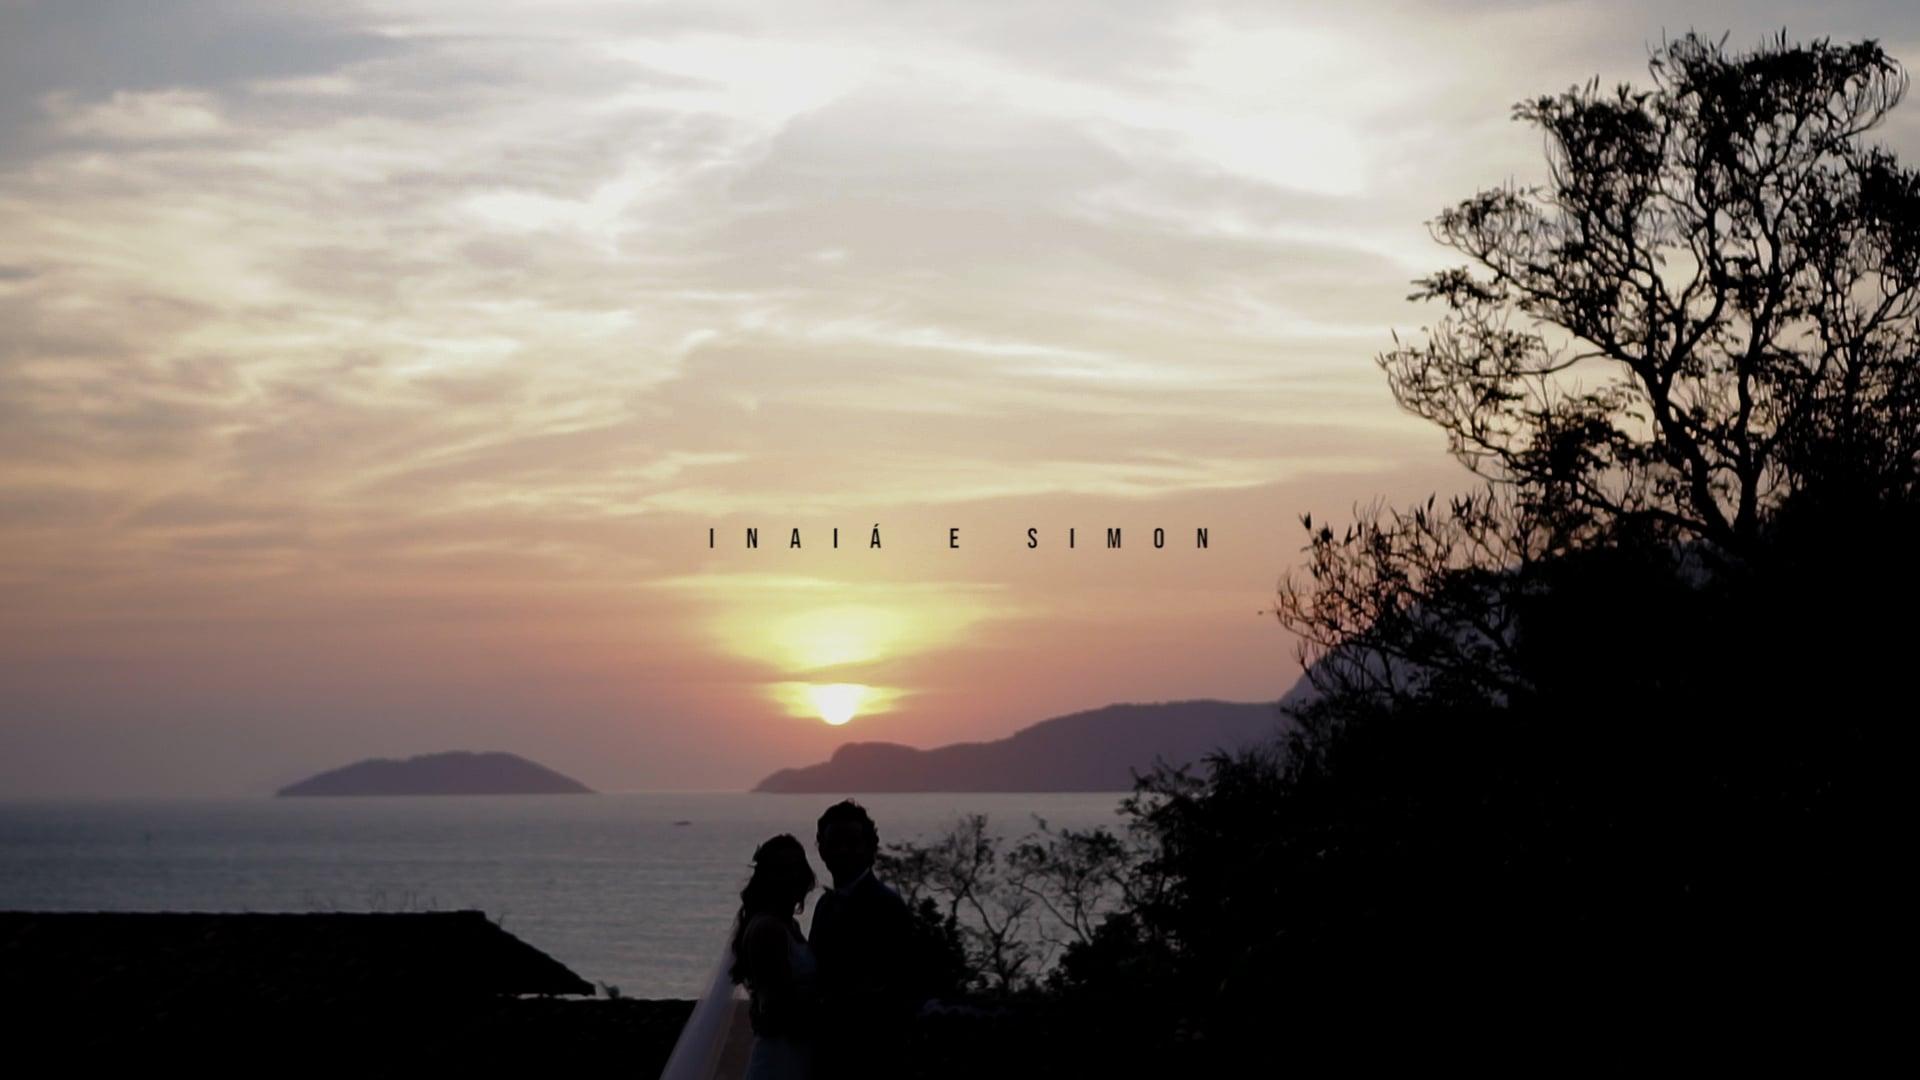 the sunset in the paradise - Inaiá e Simon